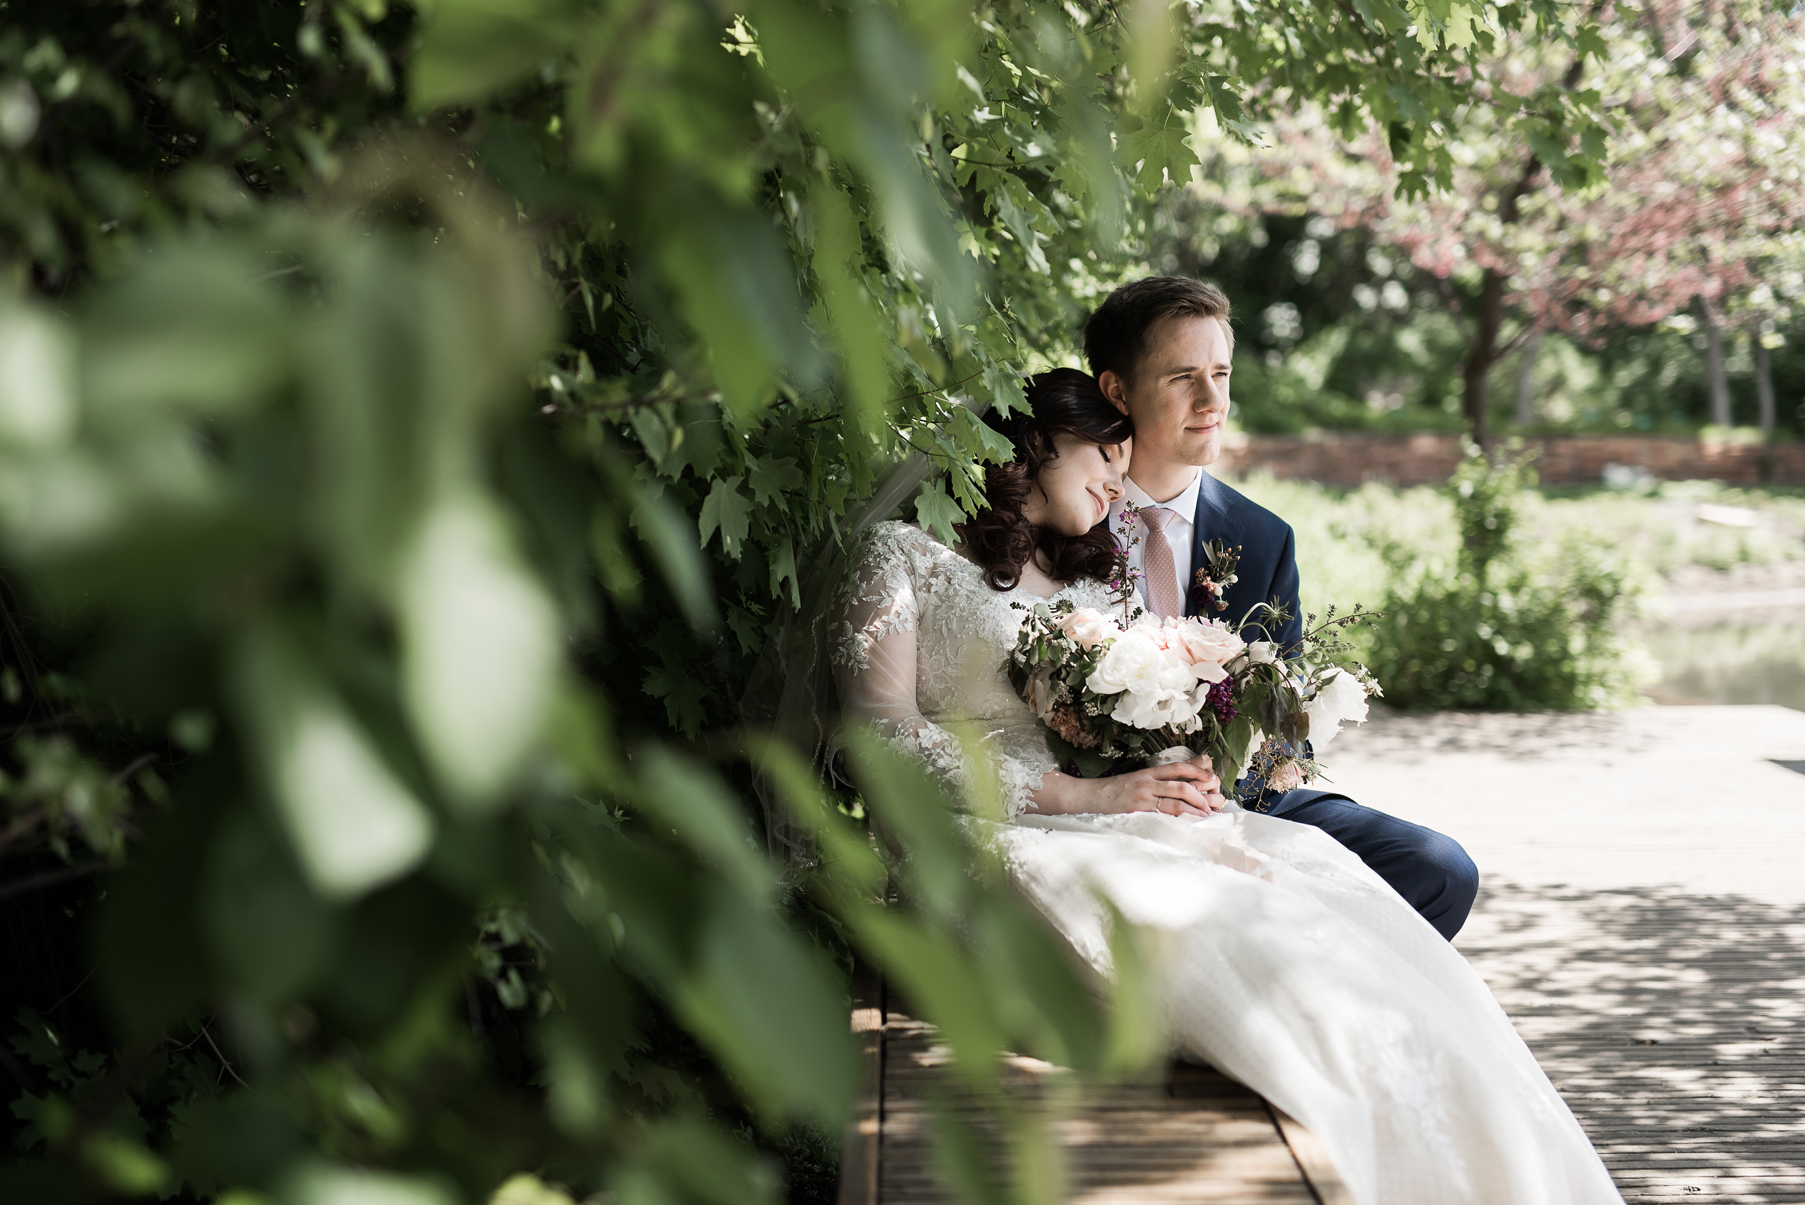 red butte gardens wedding photography | Elisha Braithwaite Photography